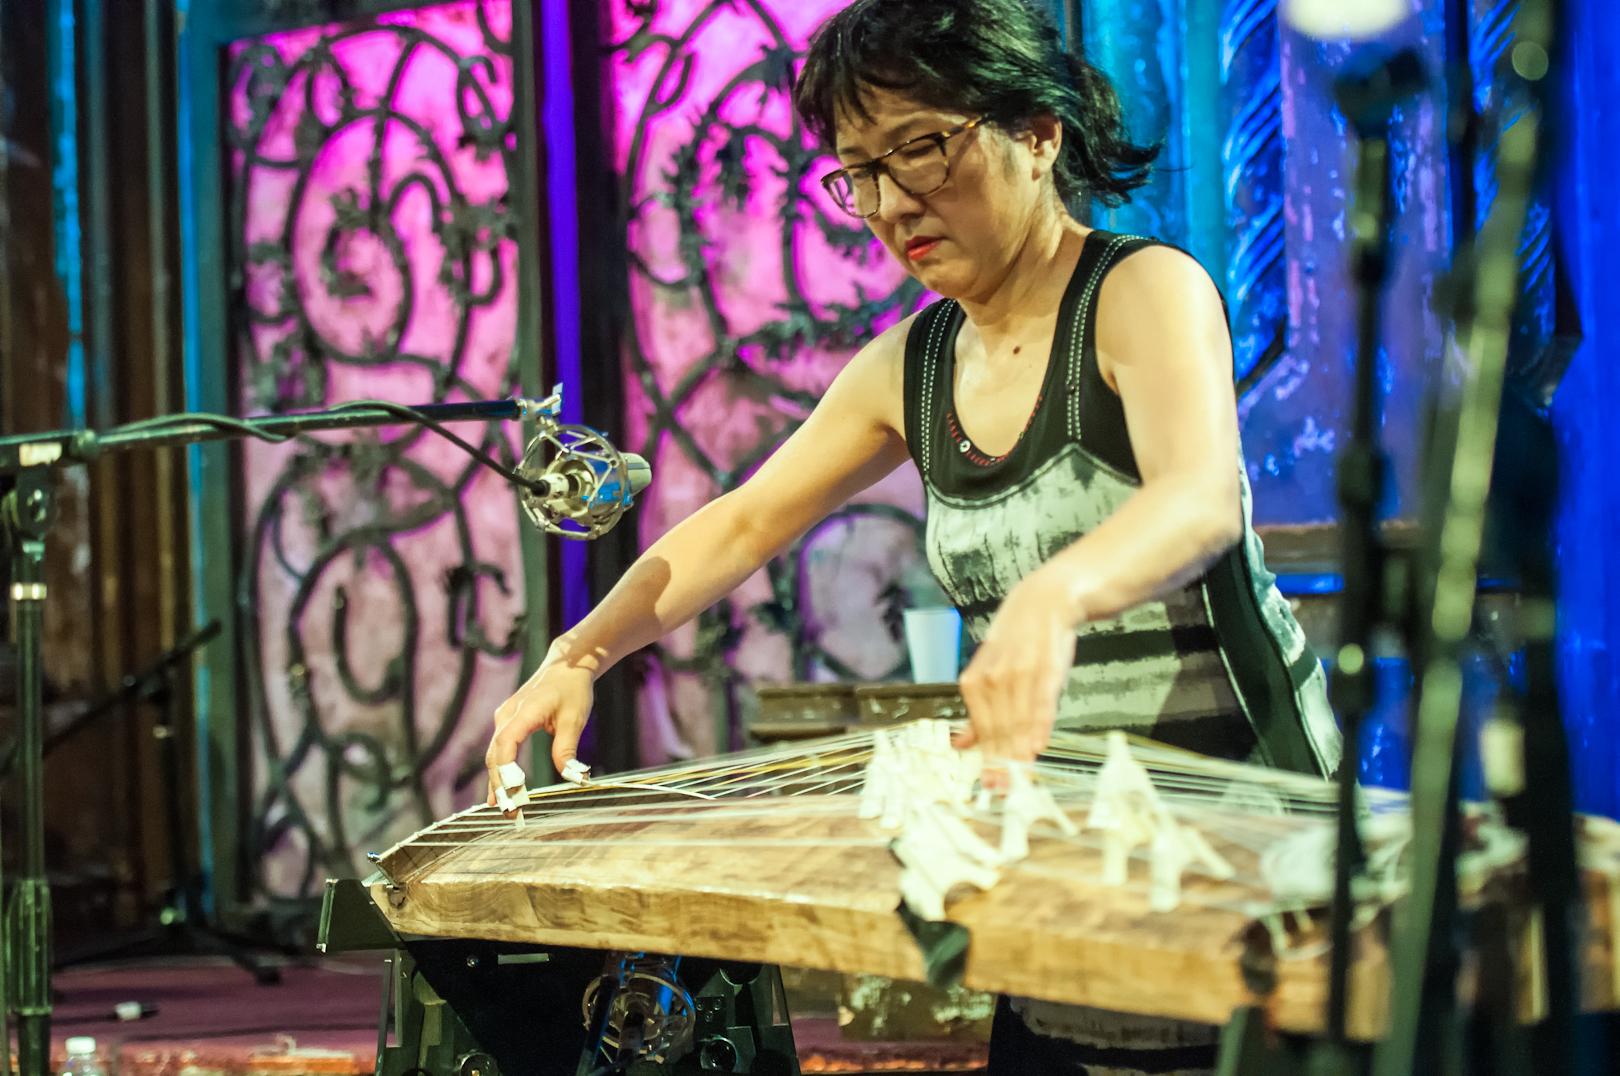 Miya Masaoka at the Under_line Benefit at Angel Orensanz Foundation